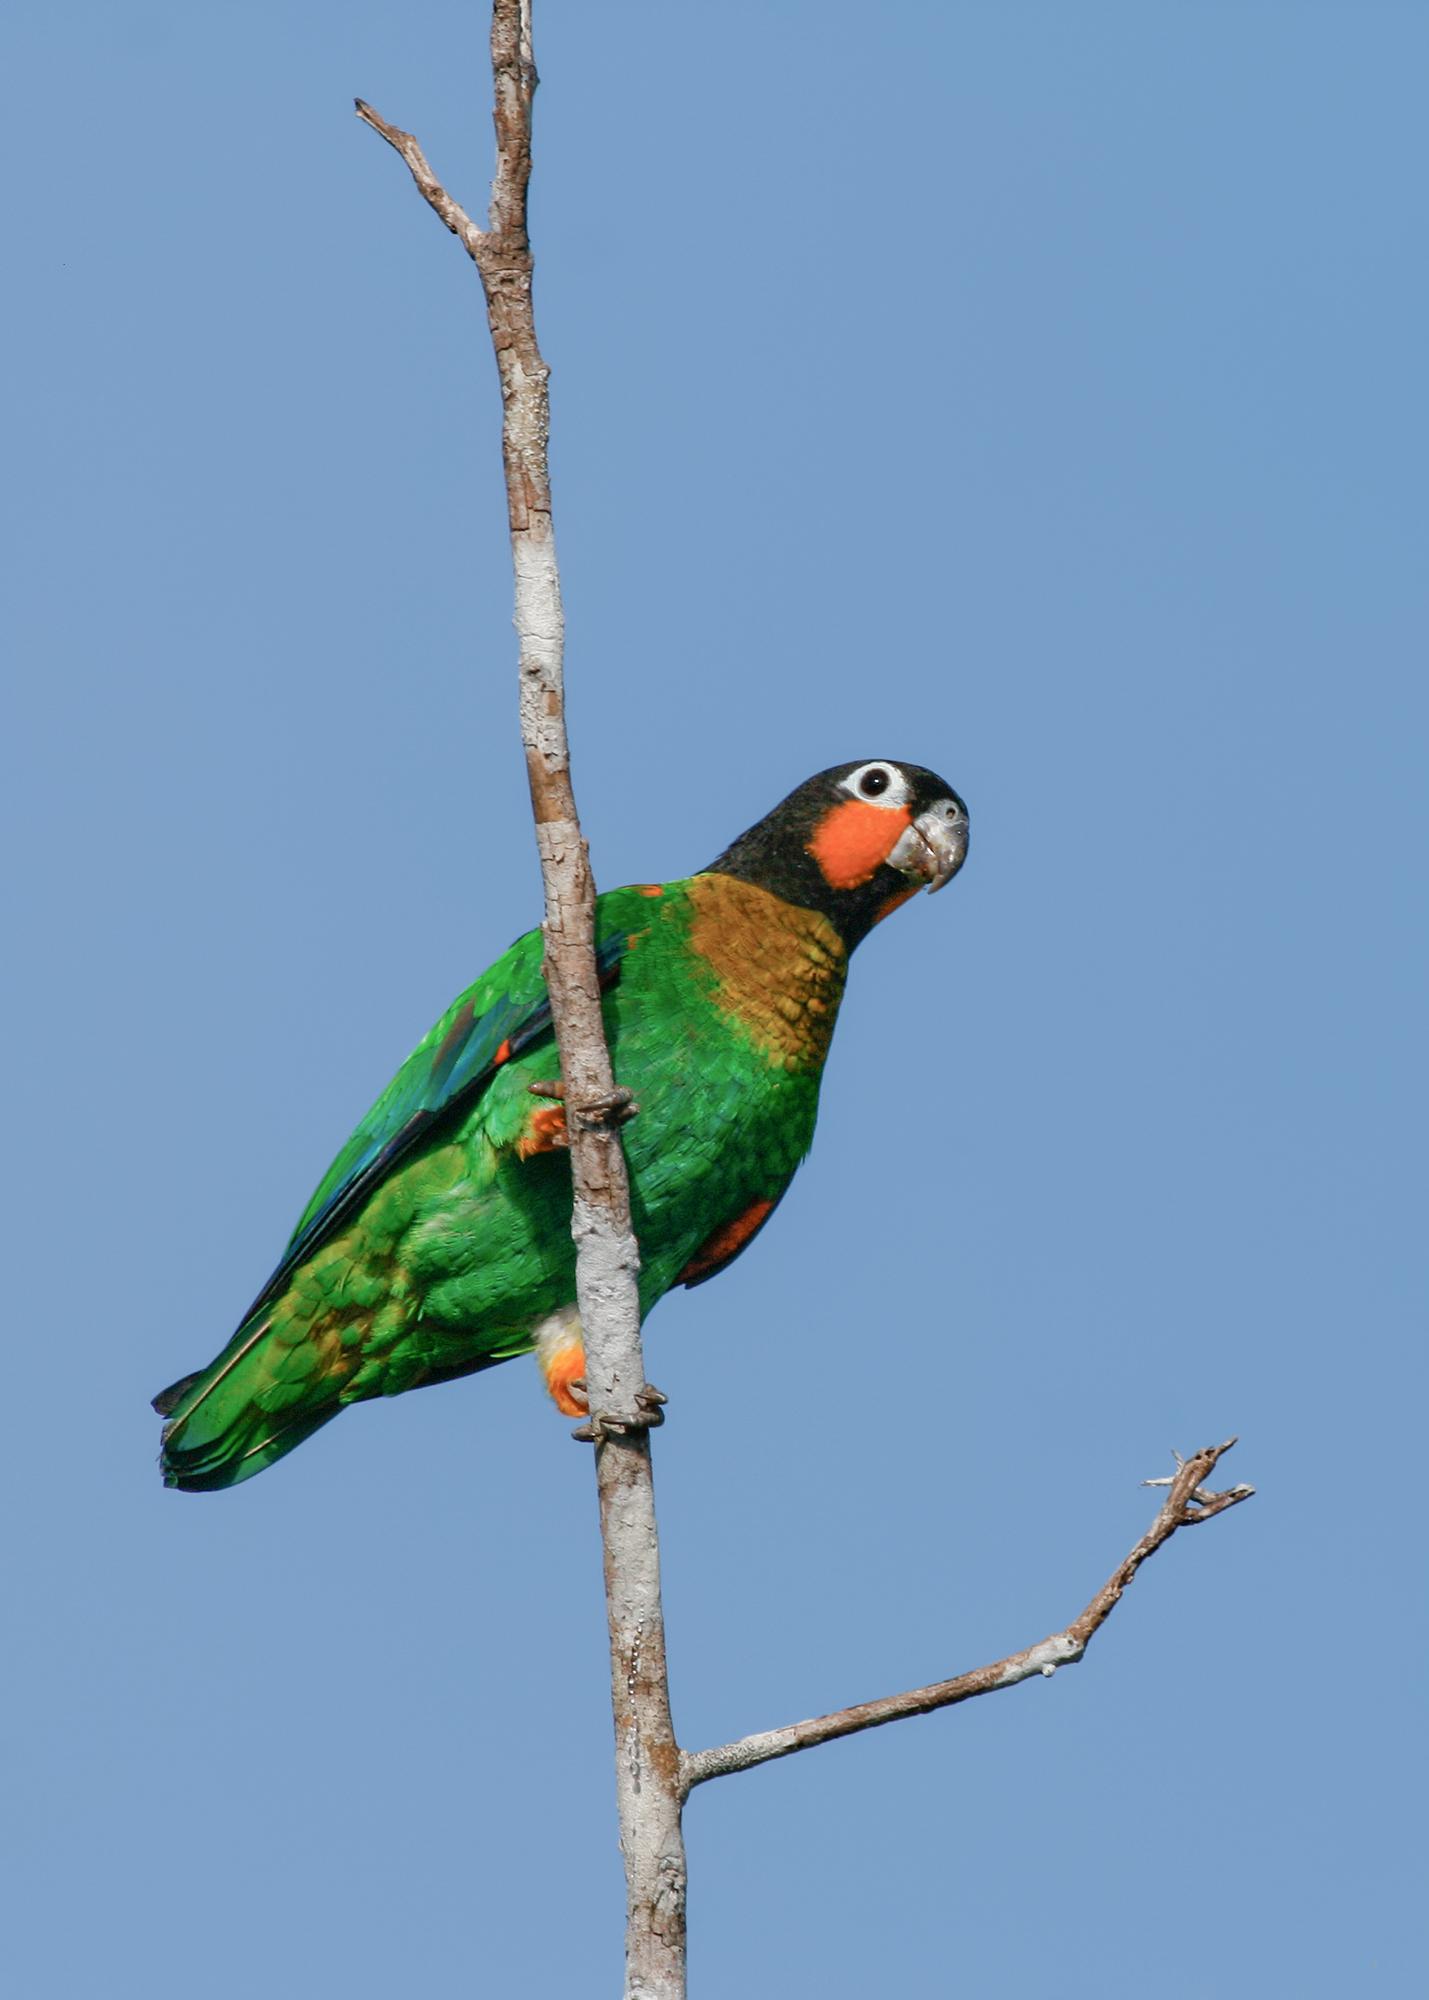 Orange-cheeked Parrot JPEG_web.jpg